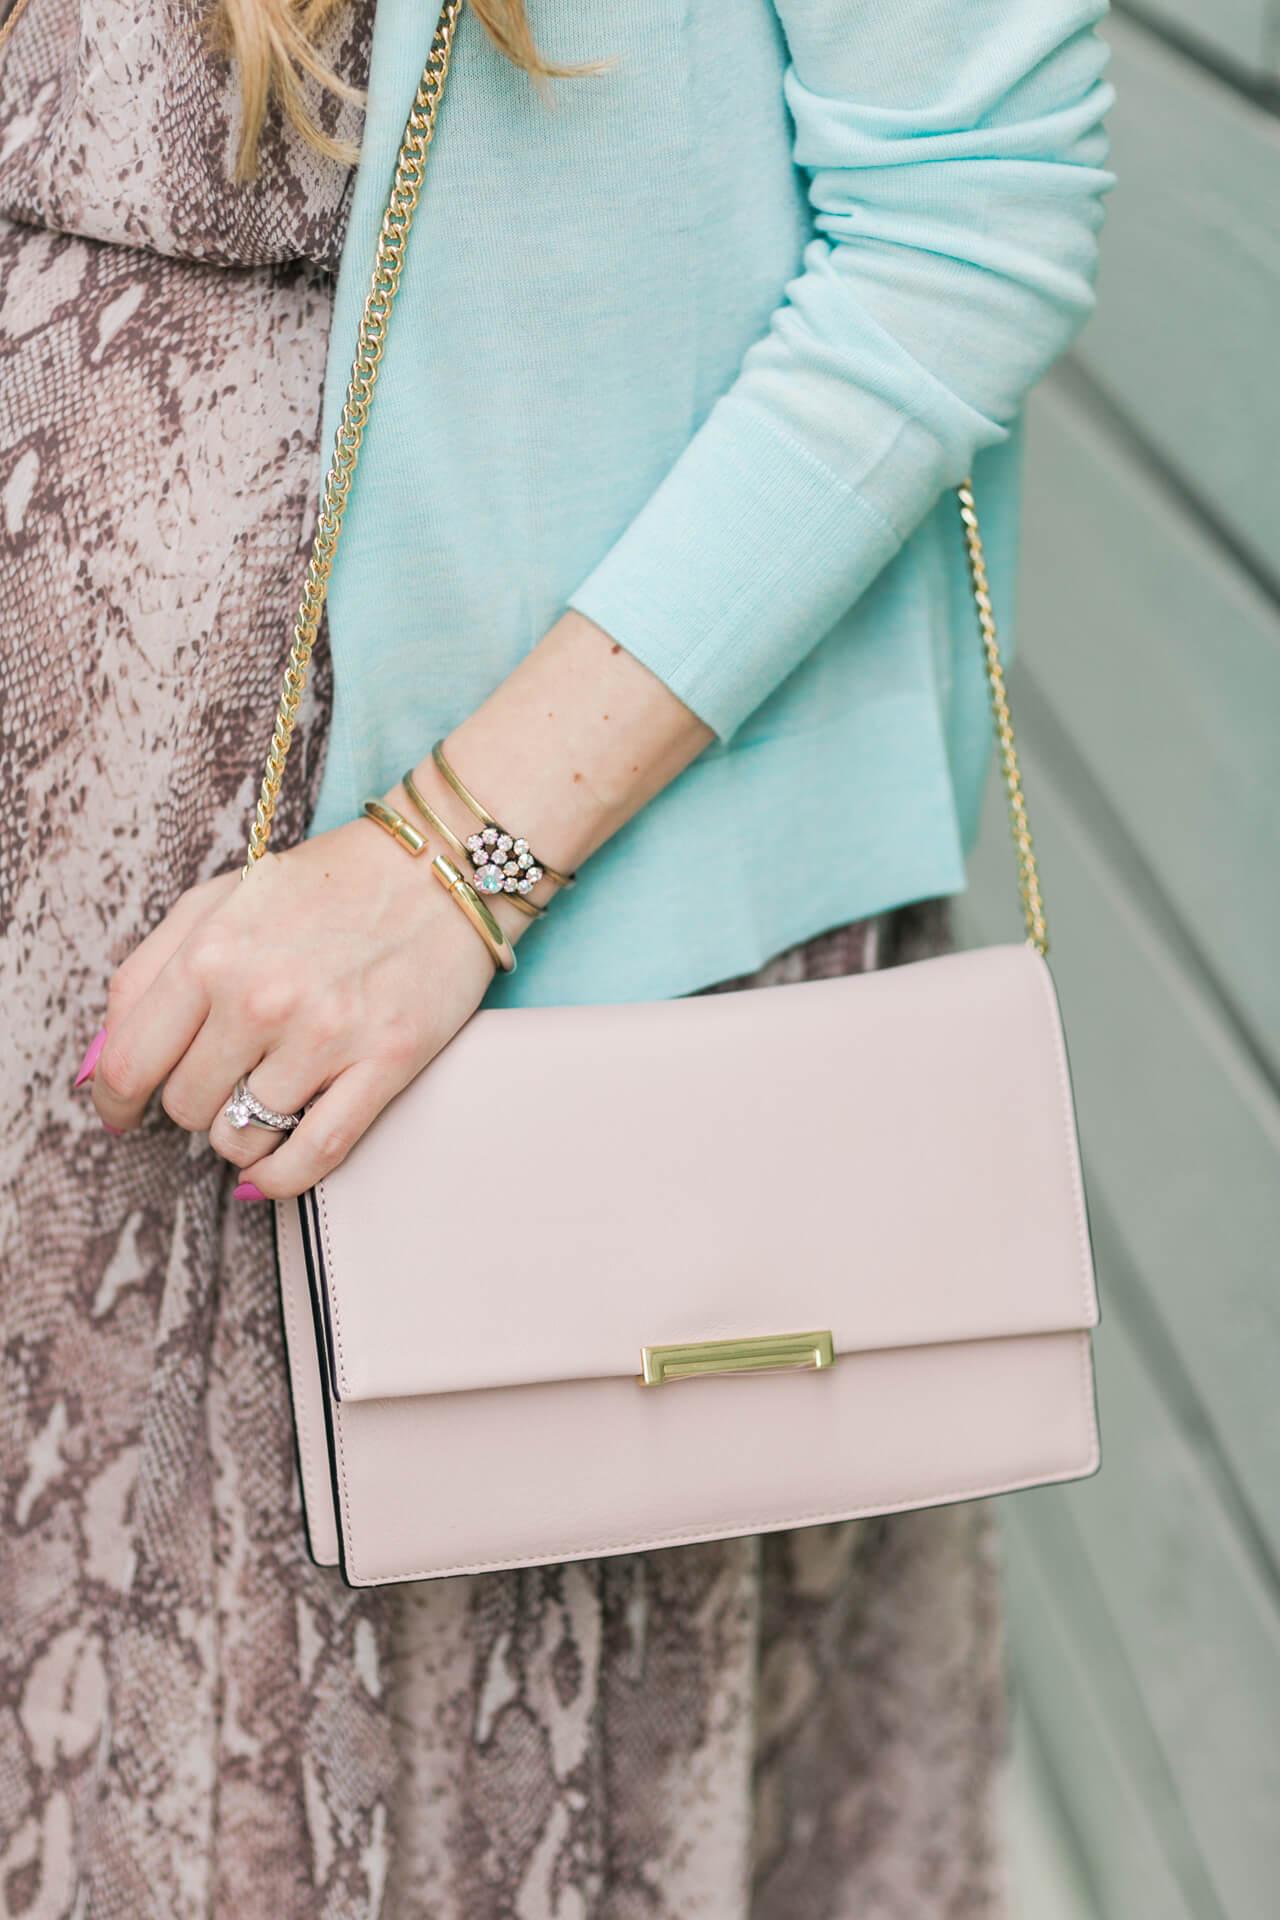 mint sweater with pink ivanka trump bag